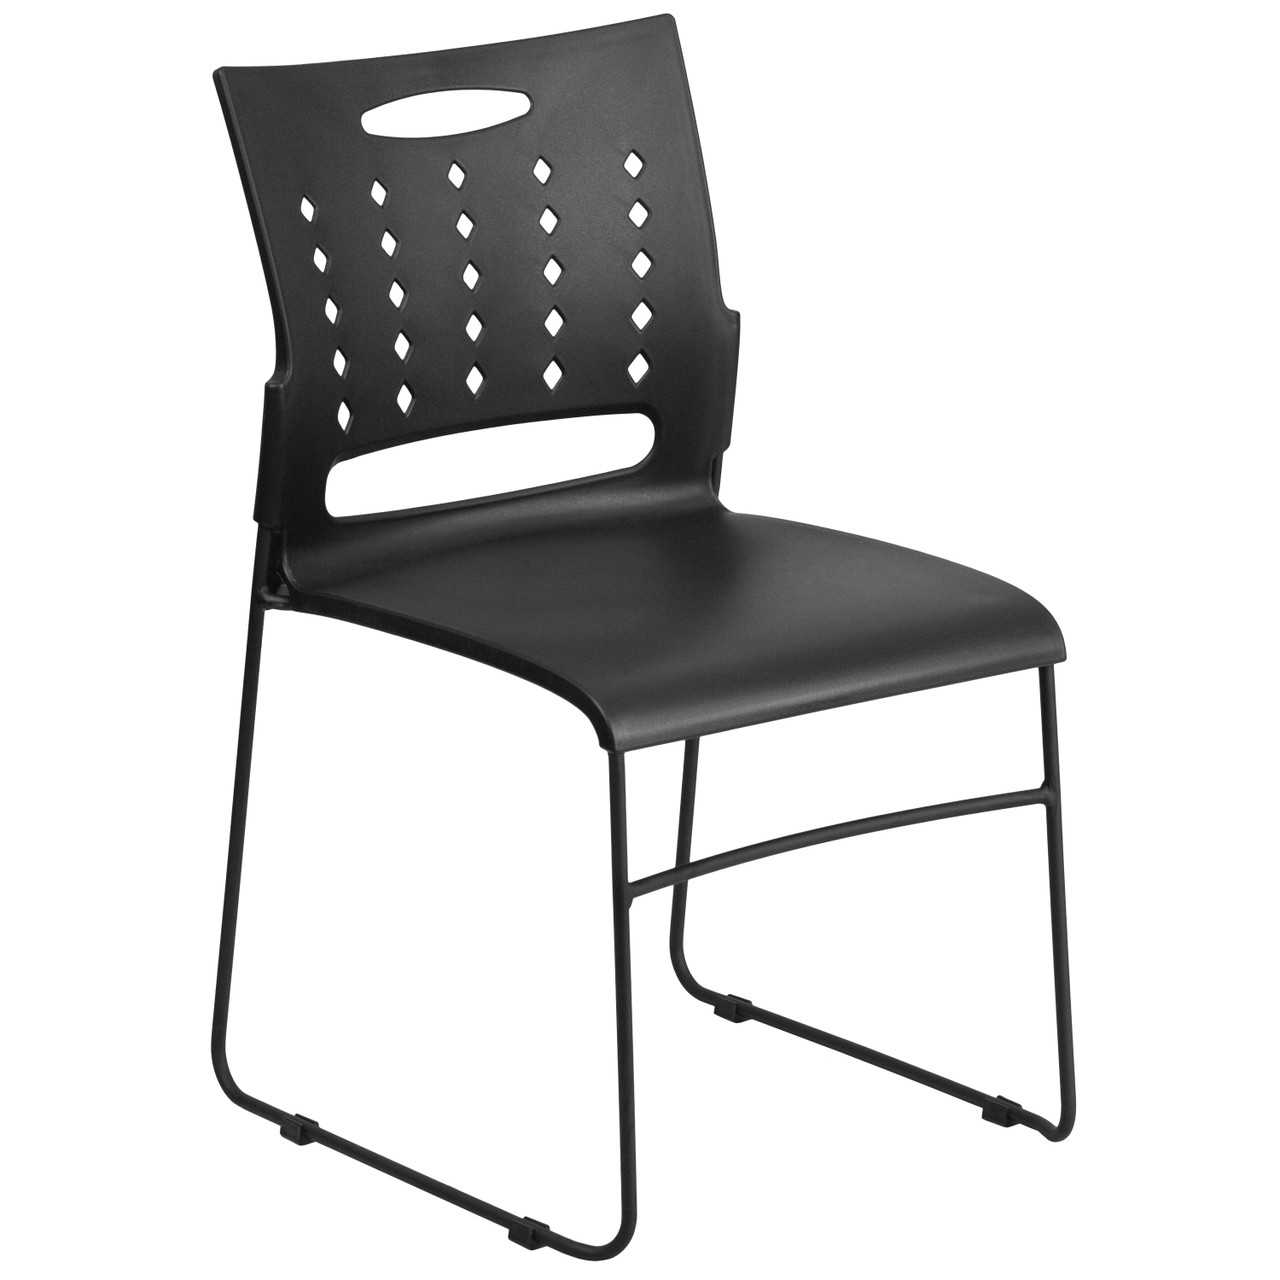 Advantage 881 Lb Capacity Black Sled Base Stack Chair With Air Vent Back Rut 2 Bk Gg